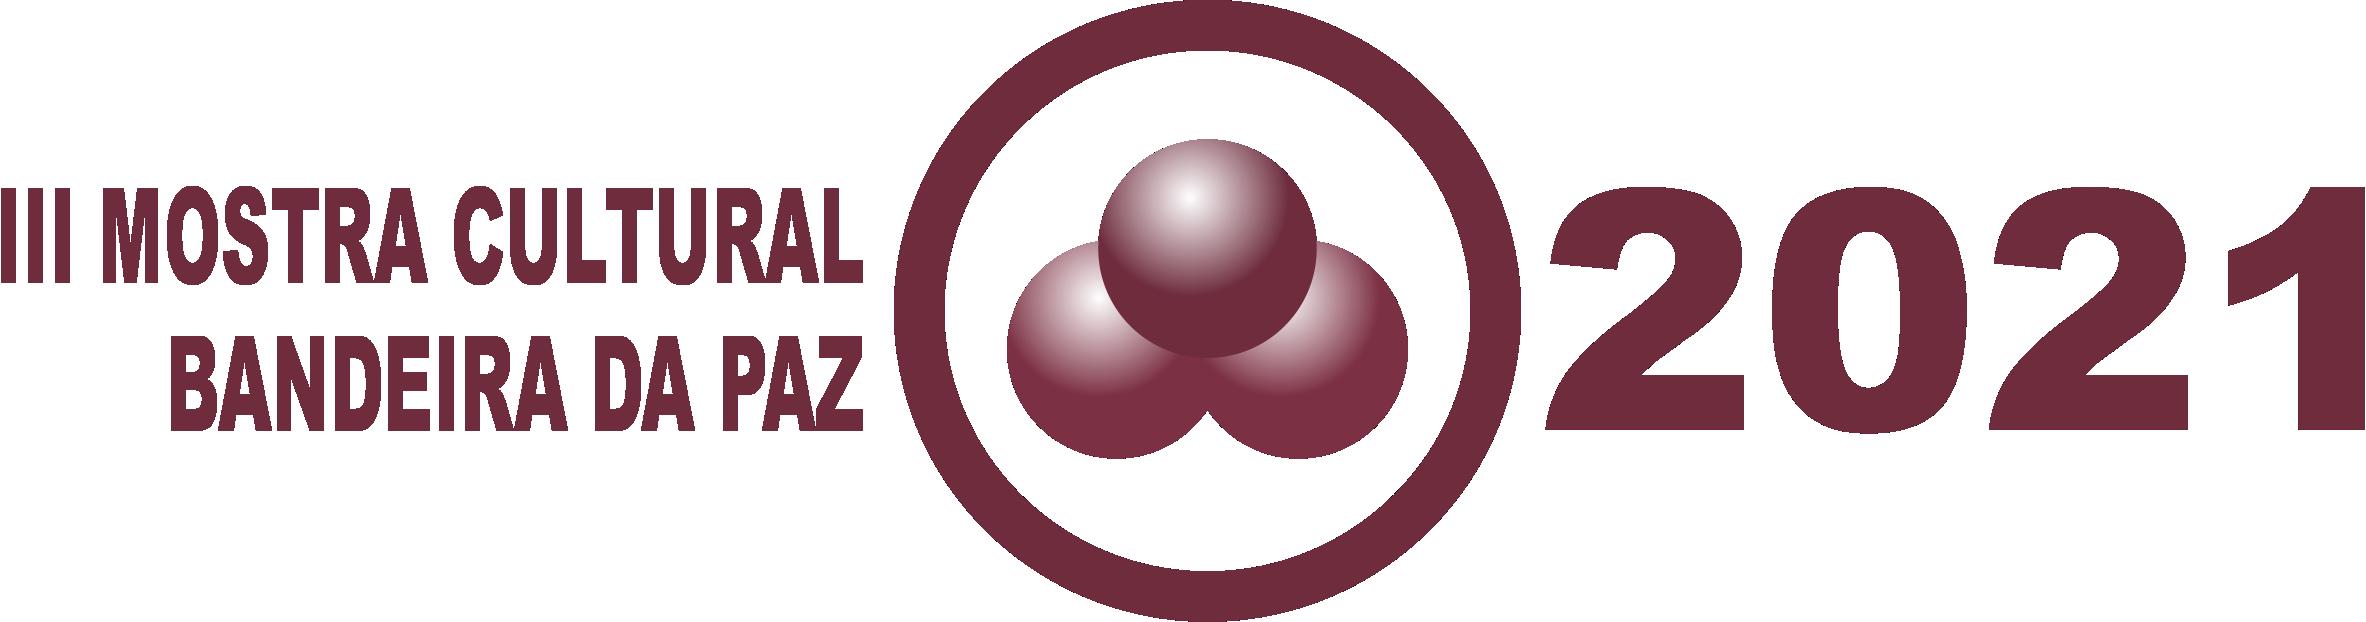 Logo Bnadeira da Paz 2021_1